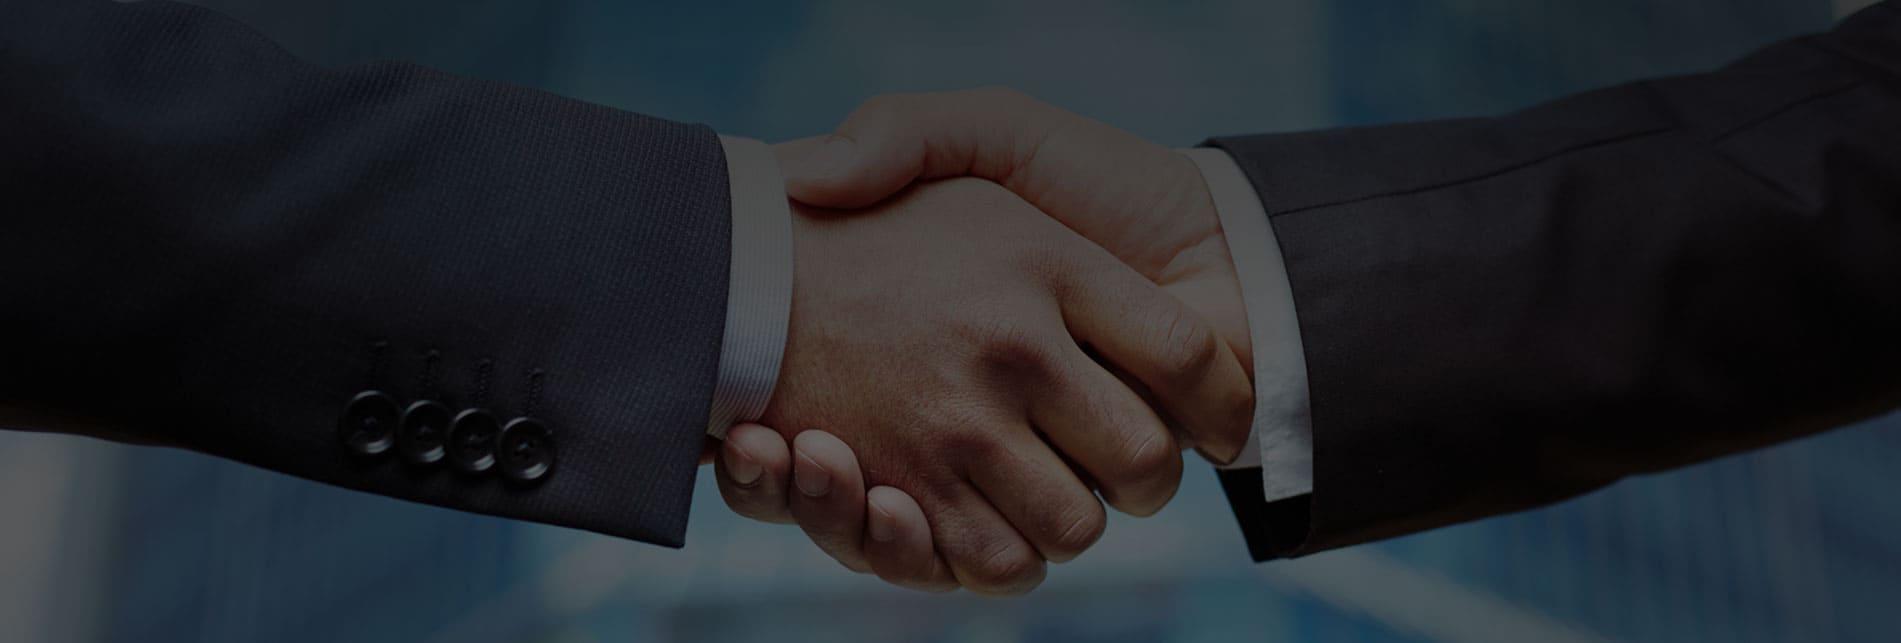 Партнерство и сотрудничество